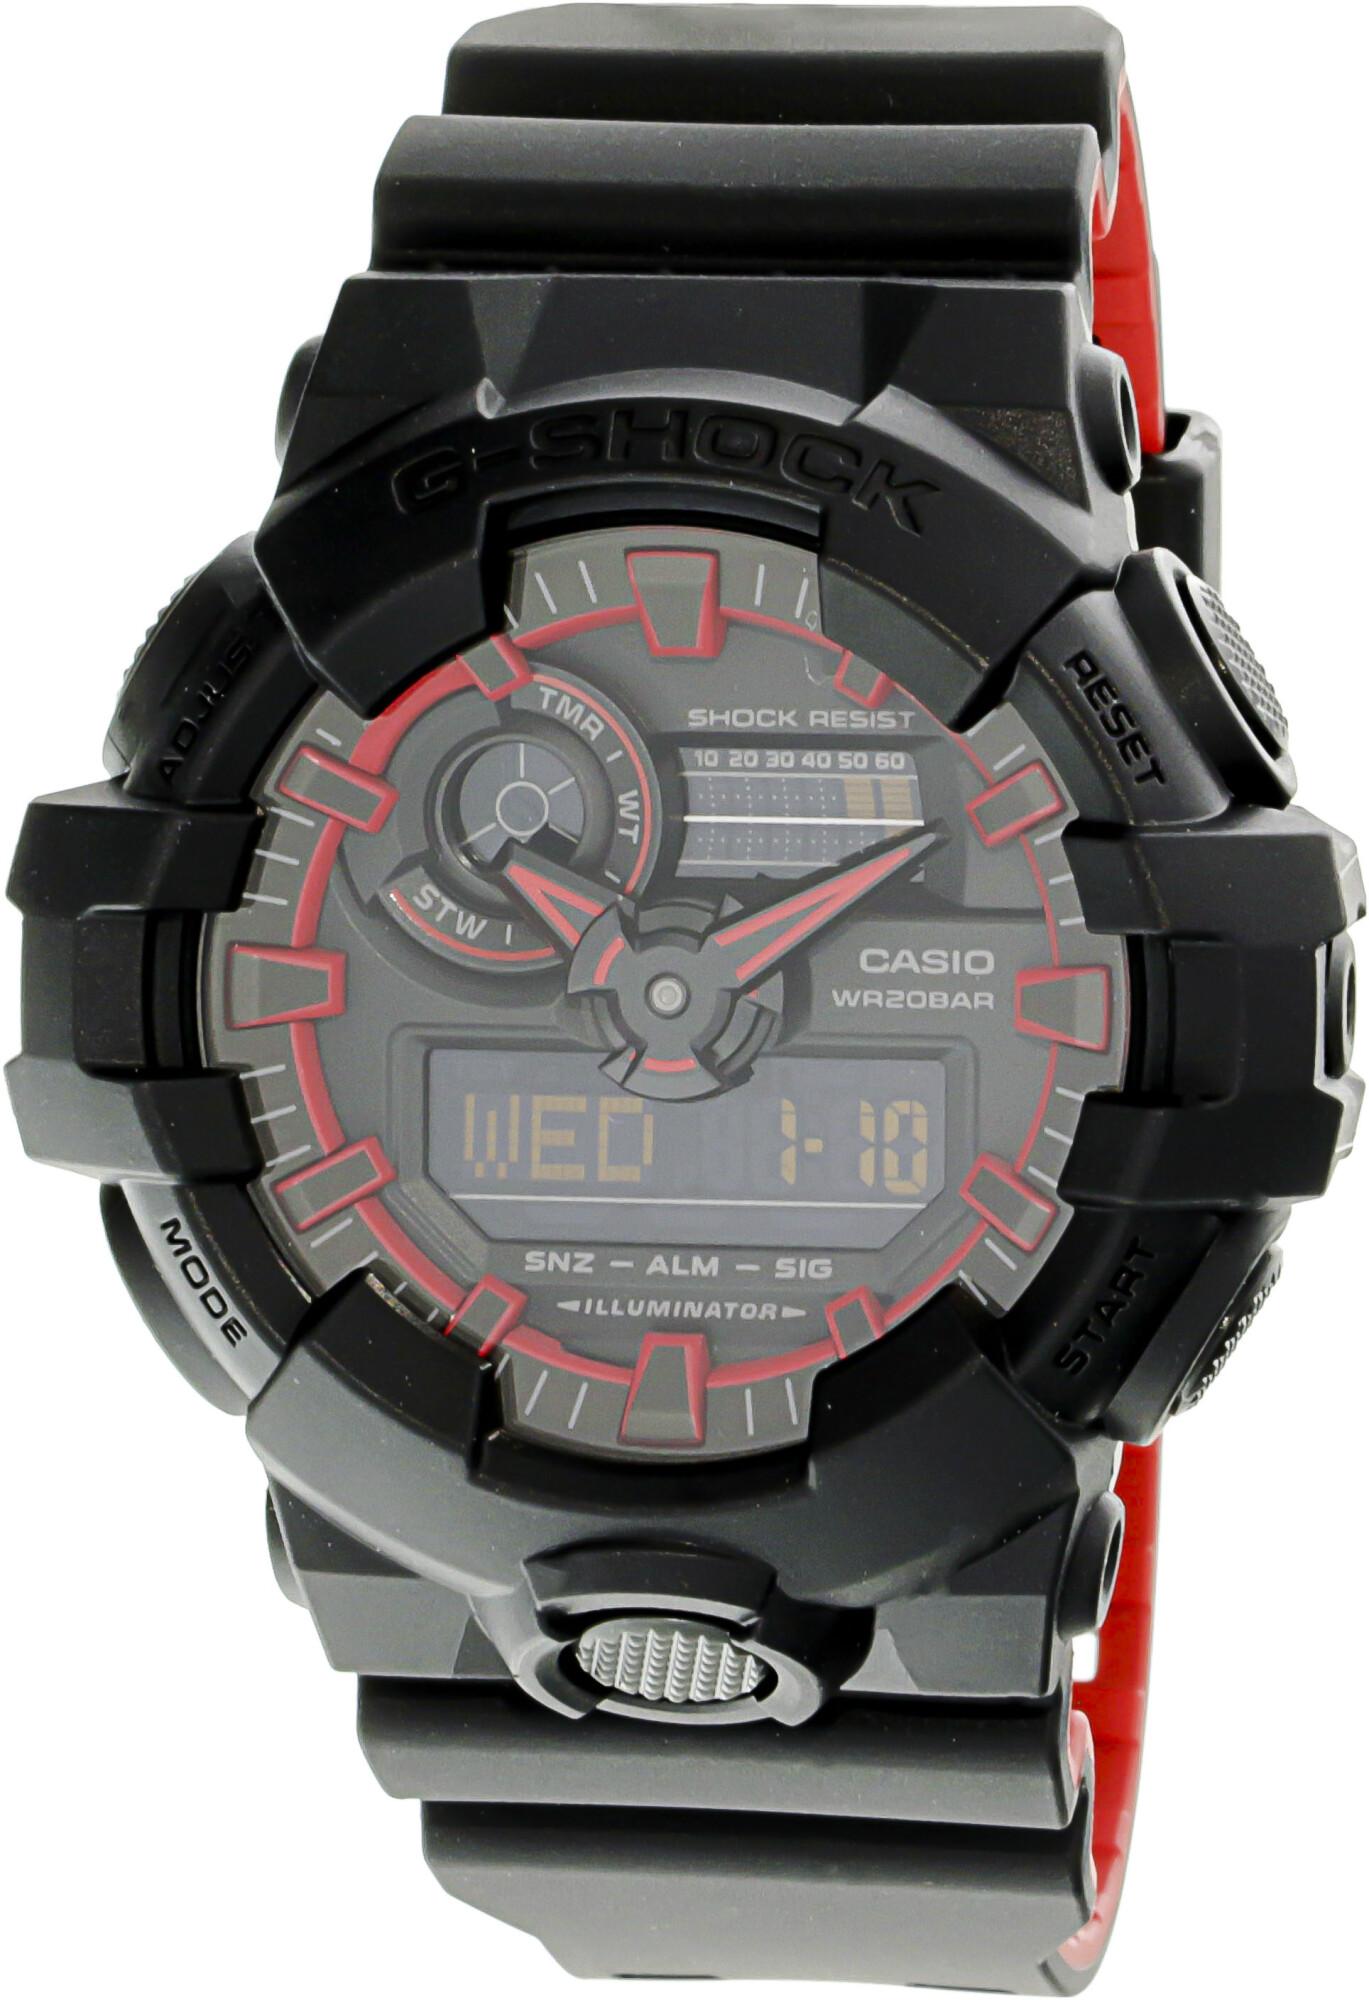 Casio Mens G-Shock GA700SE-1A4 Black Resin Japanese Quartz Sport Watch